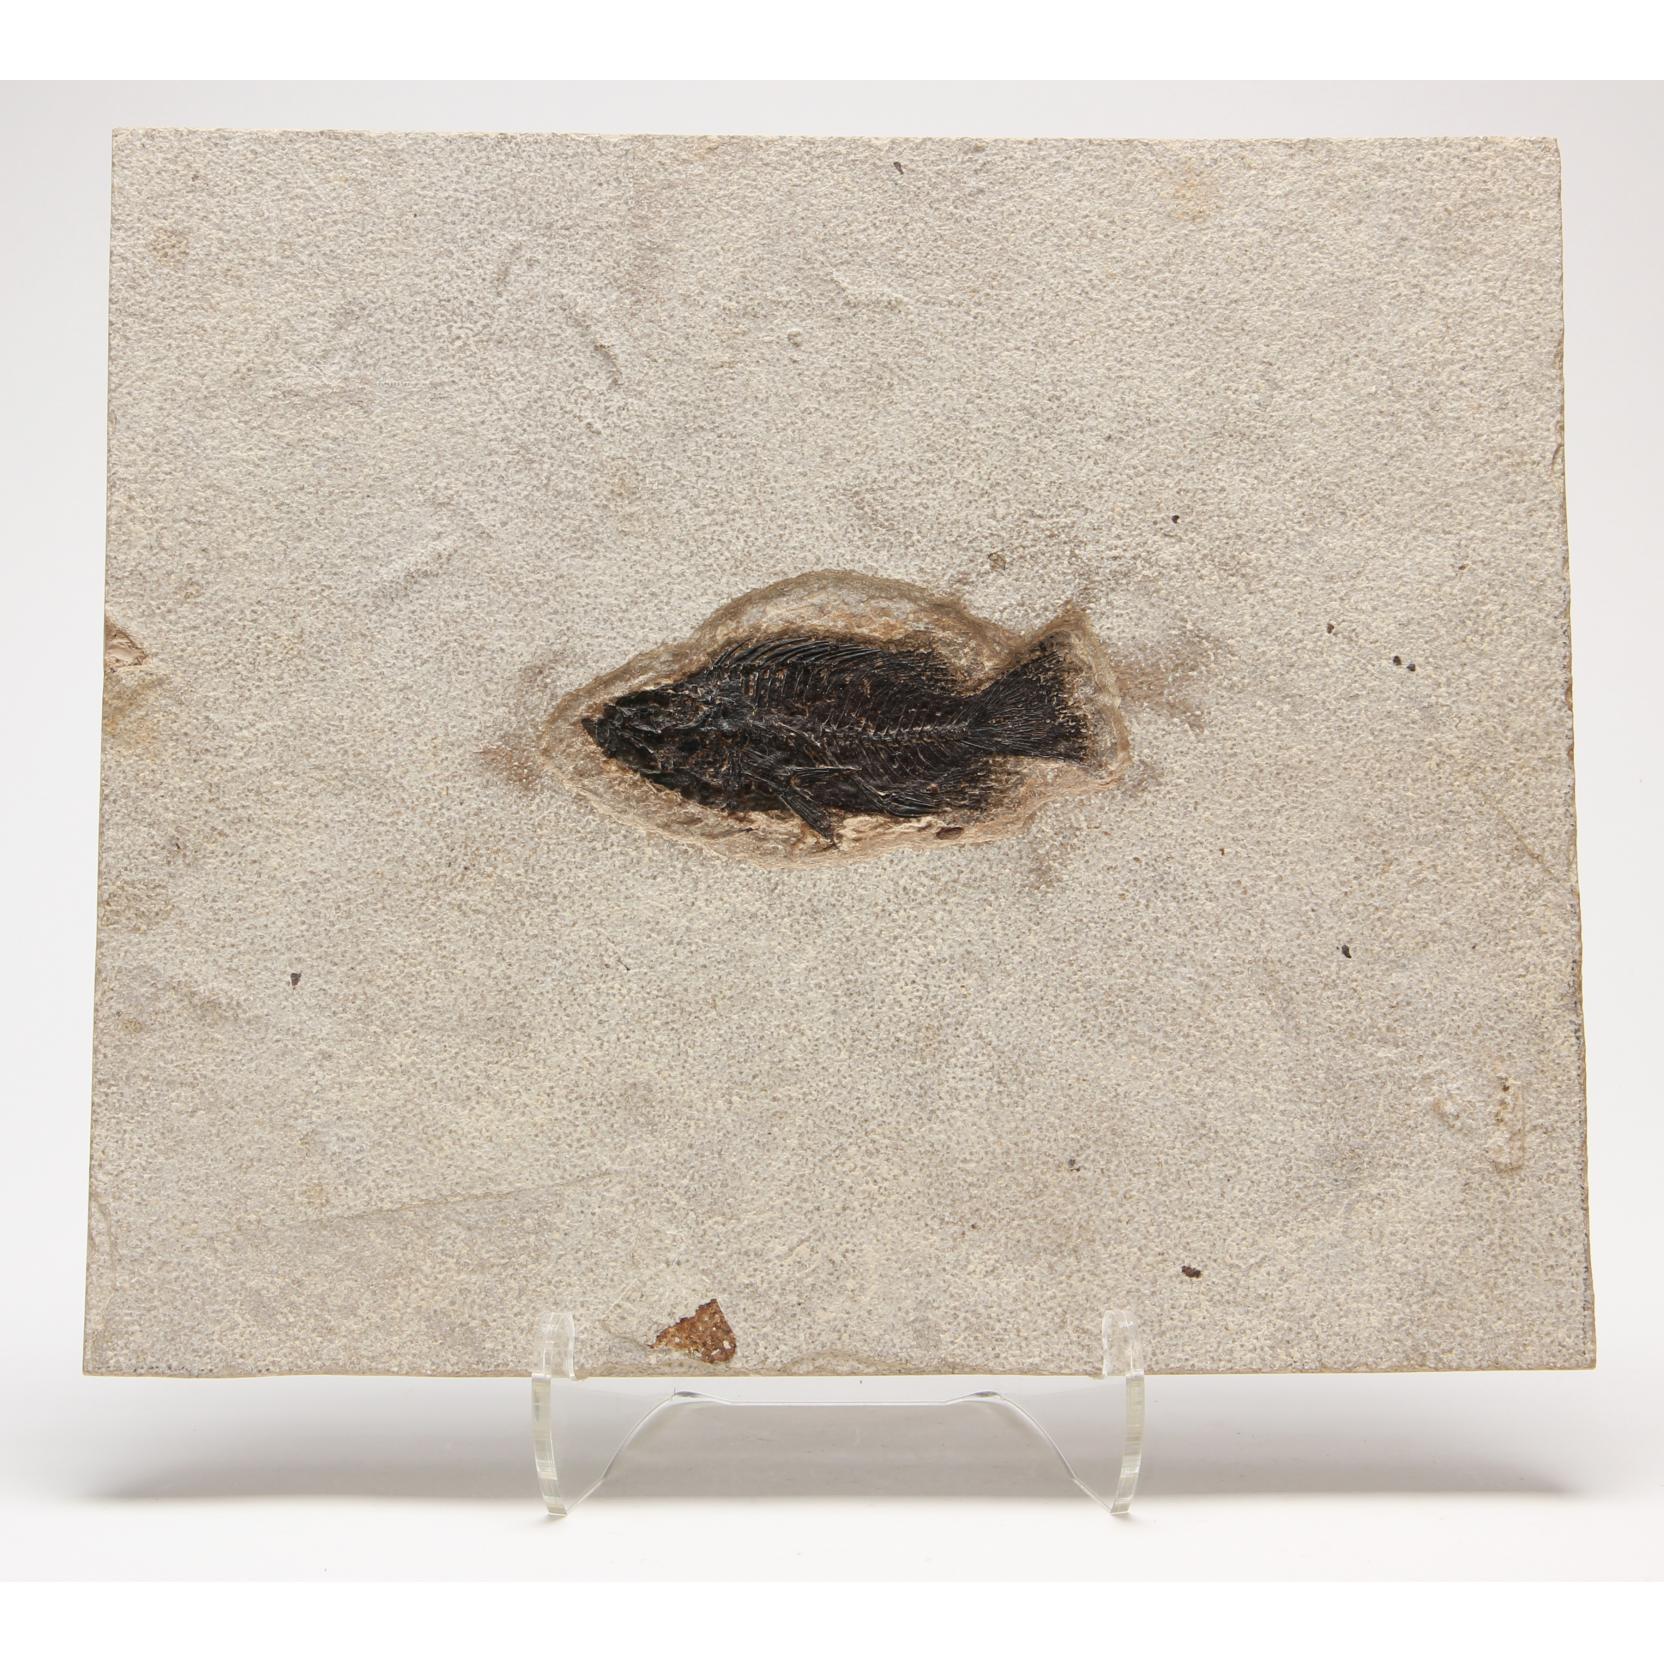 cretaceous-or-eocene-fish-fossil